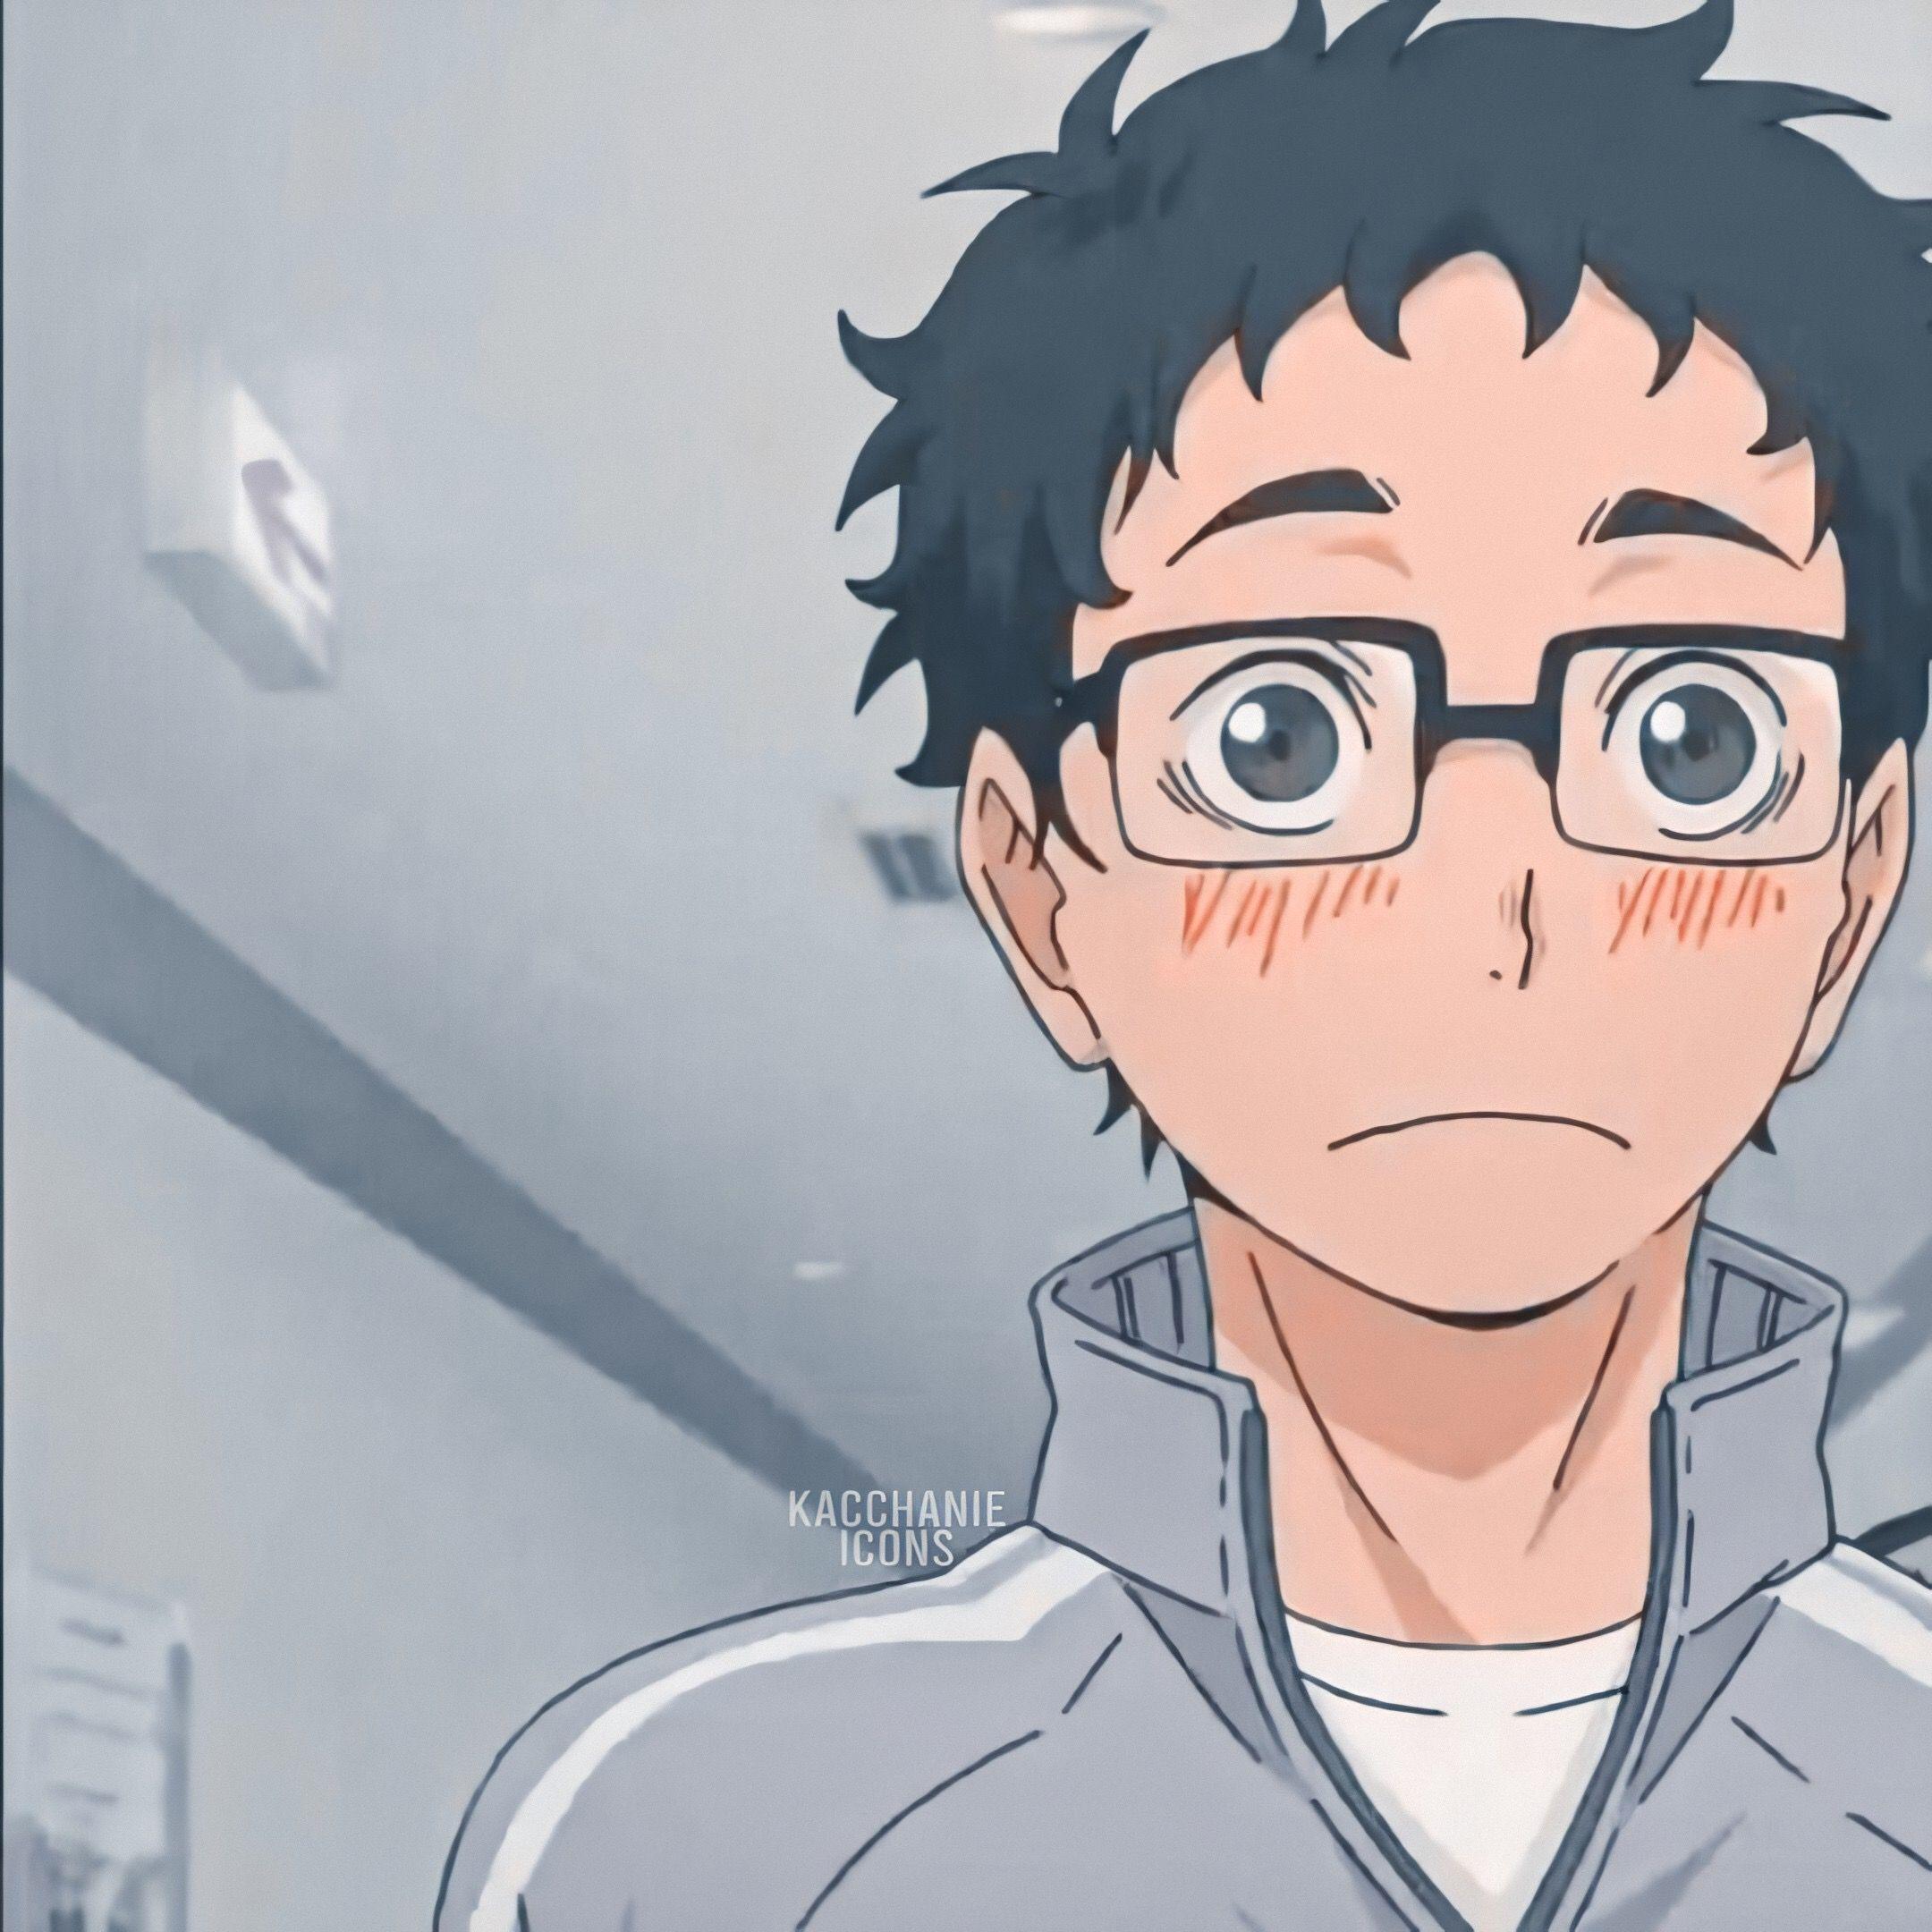 ୖ༣ 𝚖𝚊𝚝𝚌𝚑༞☄︎ in 2020 Haikyuu, Anime, Icon